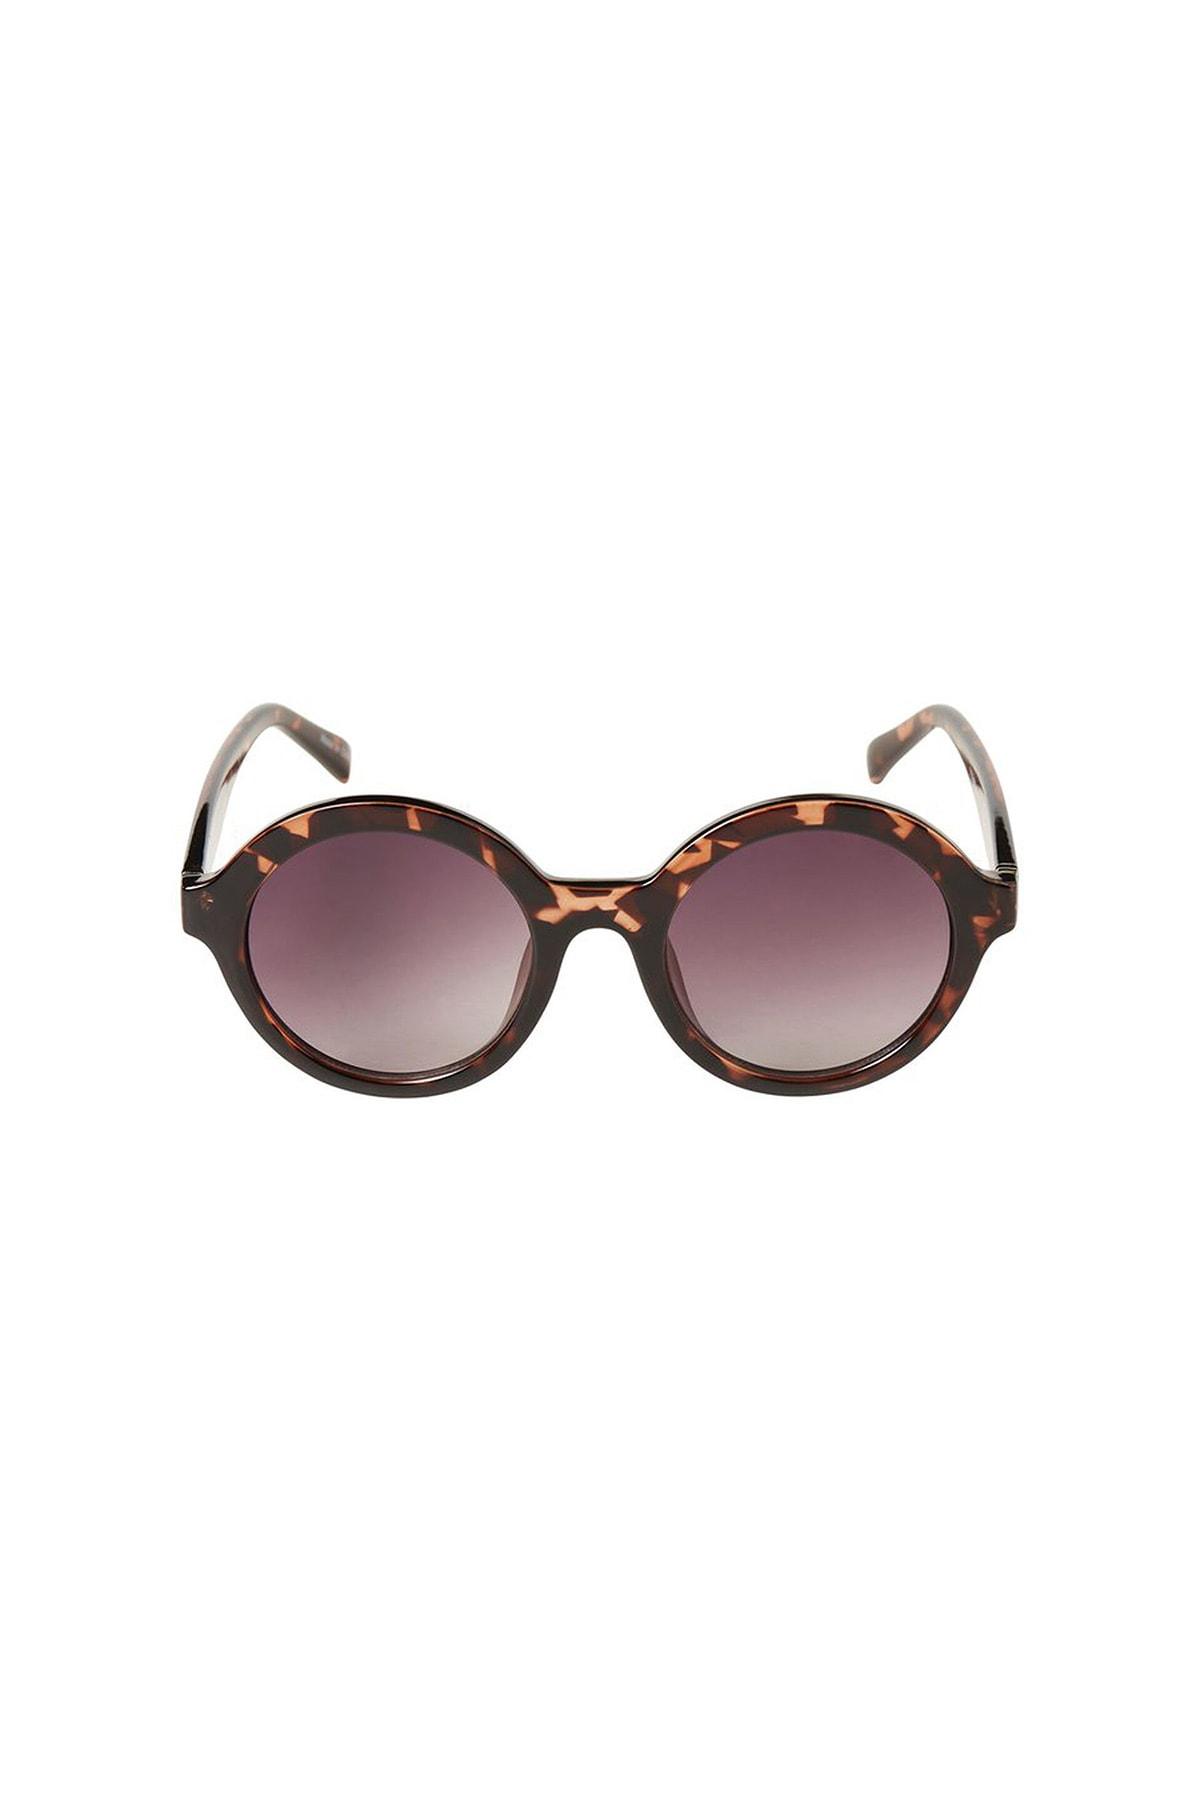 Vero Moda Accessories Vmalma Gözlük KADIN GÖZLÜK 10224604 1